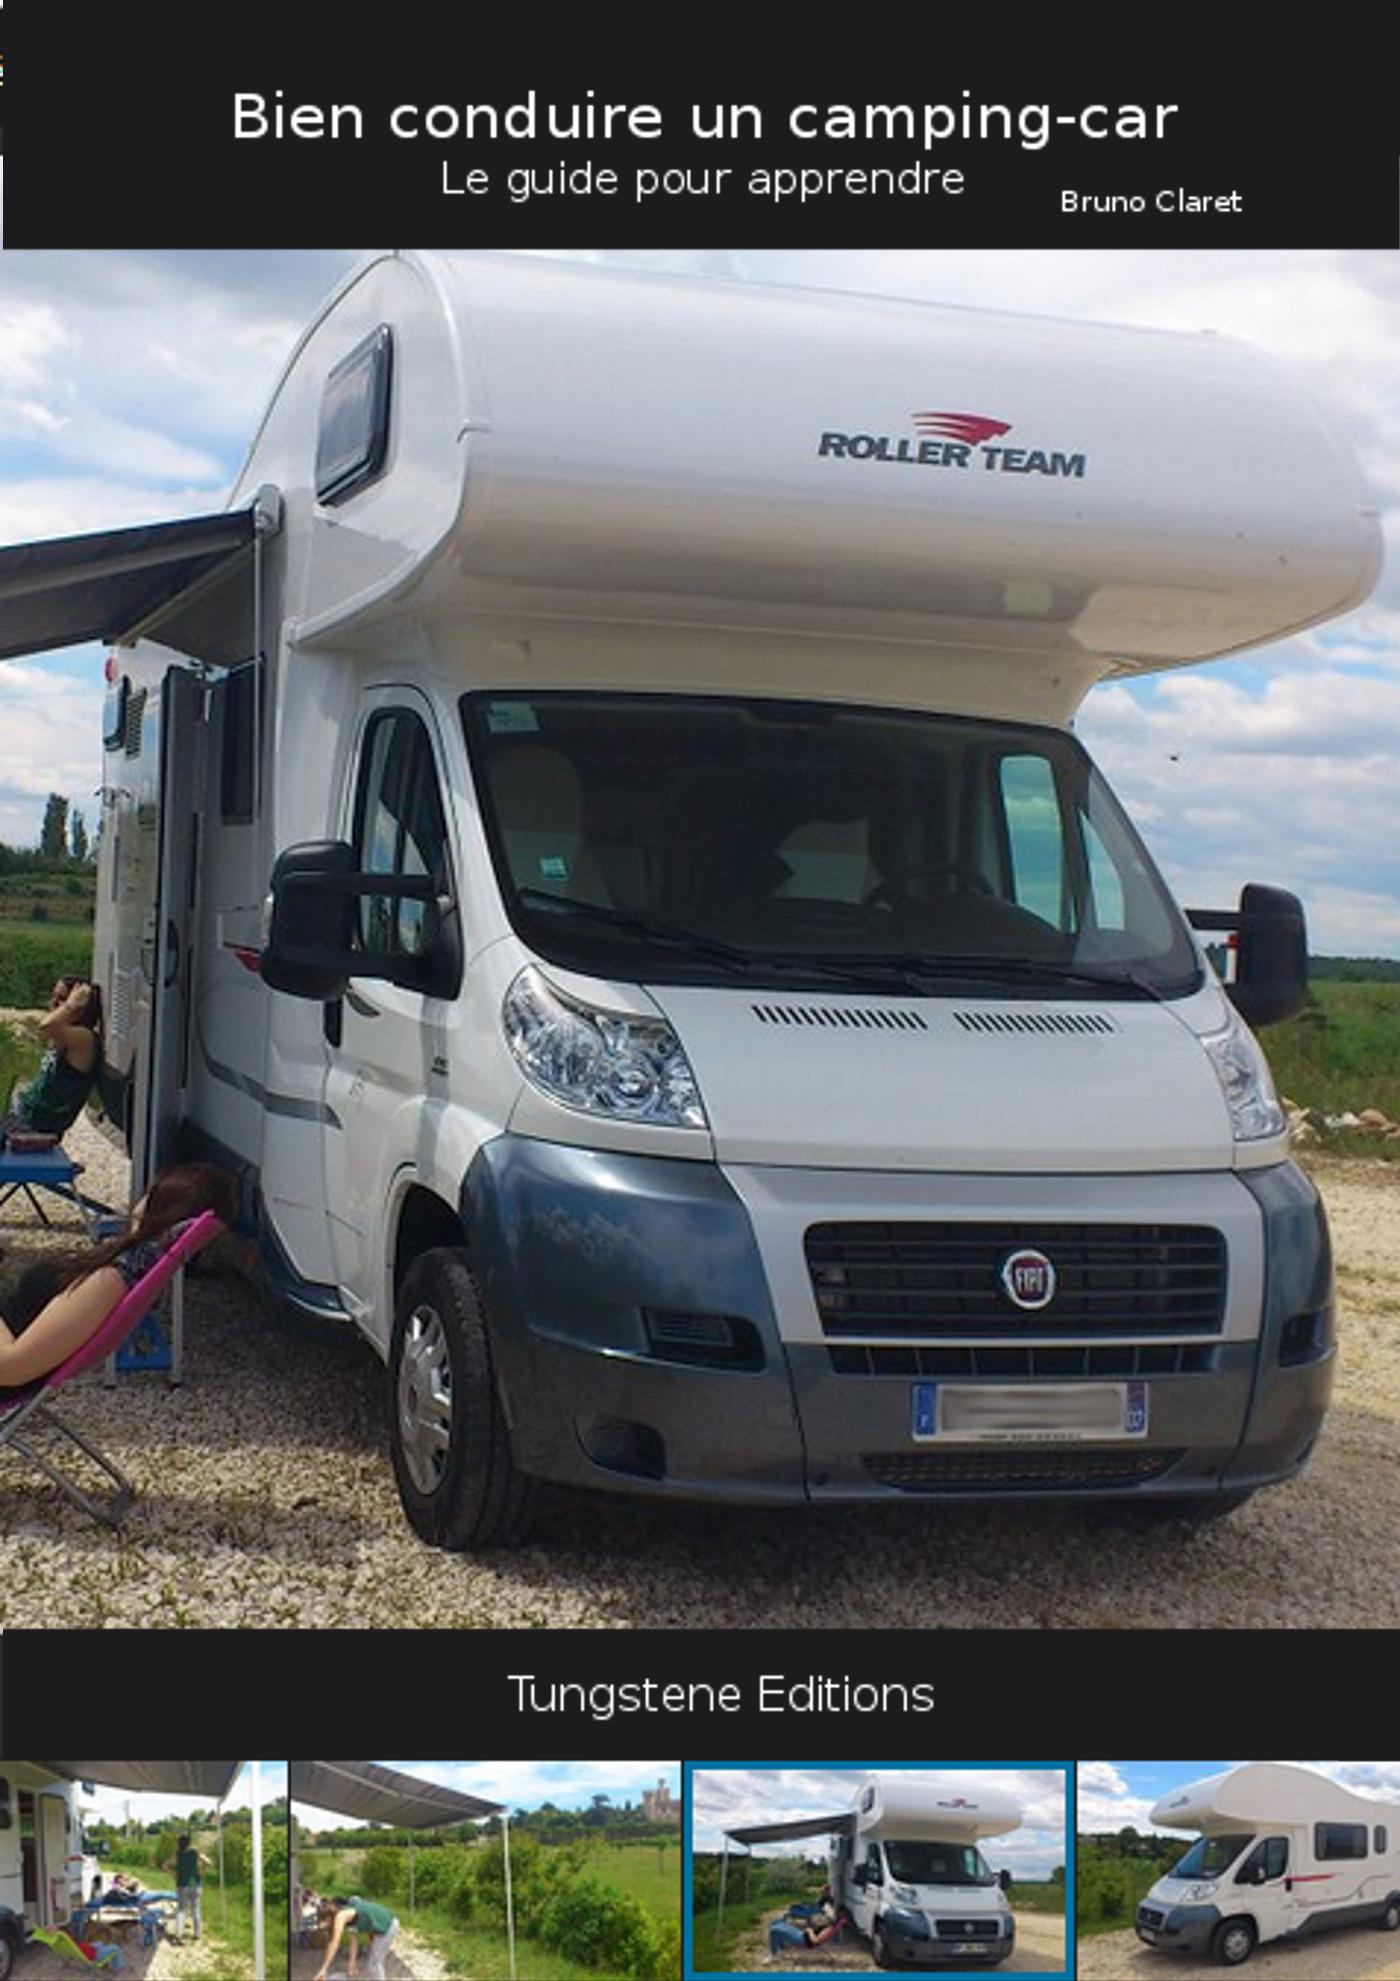 Bien conduire un camping car